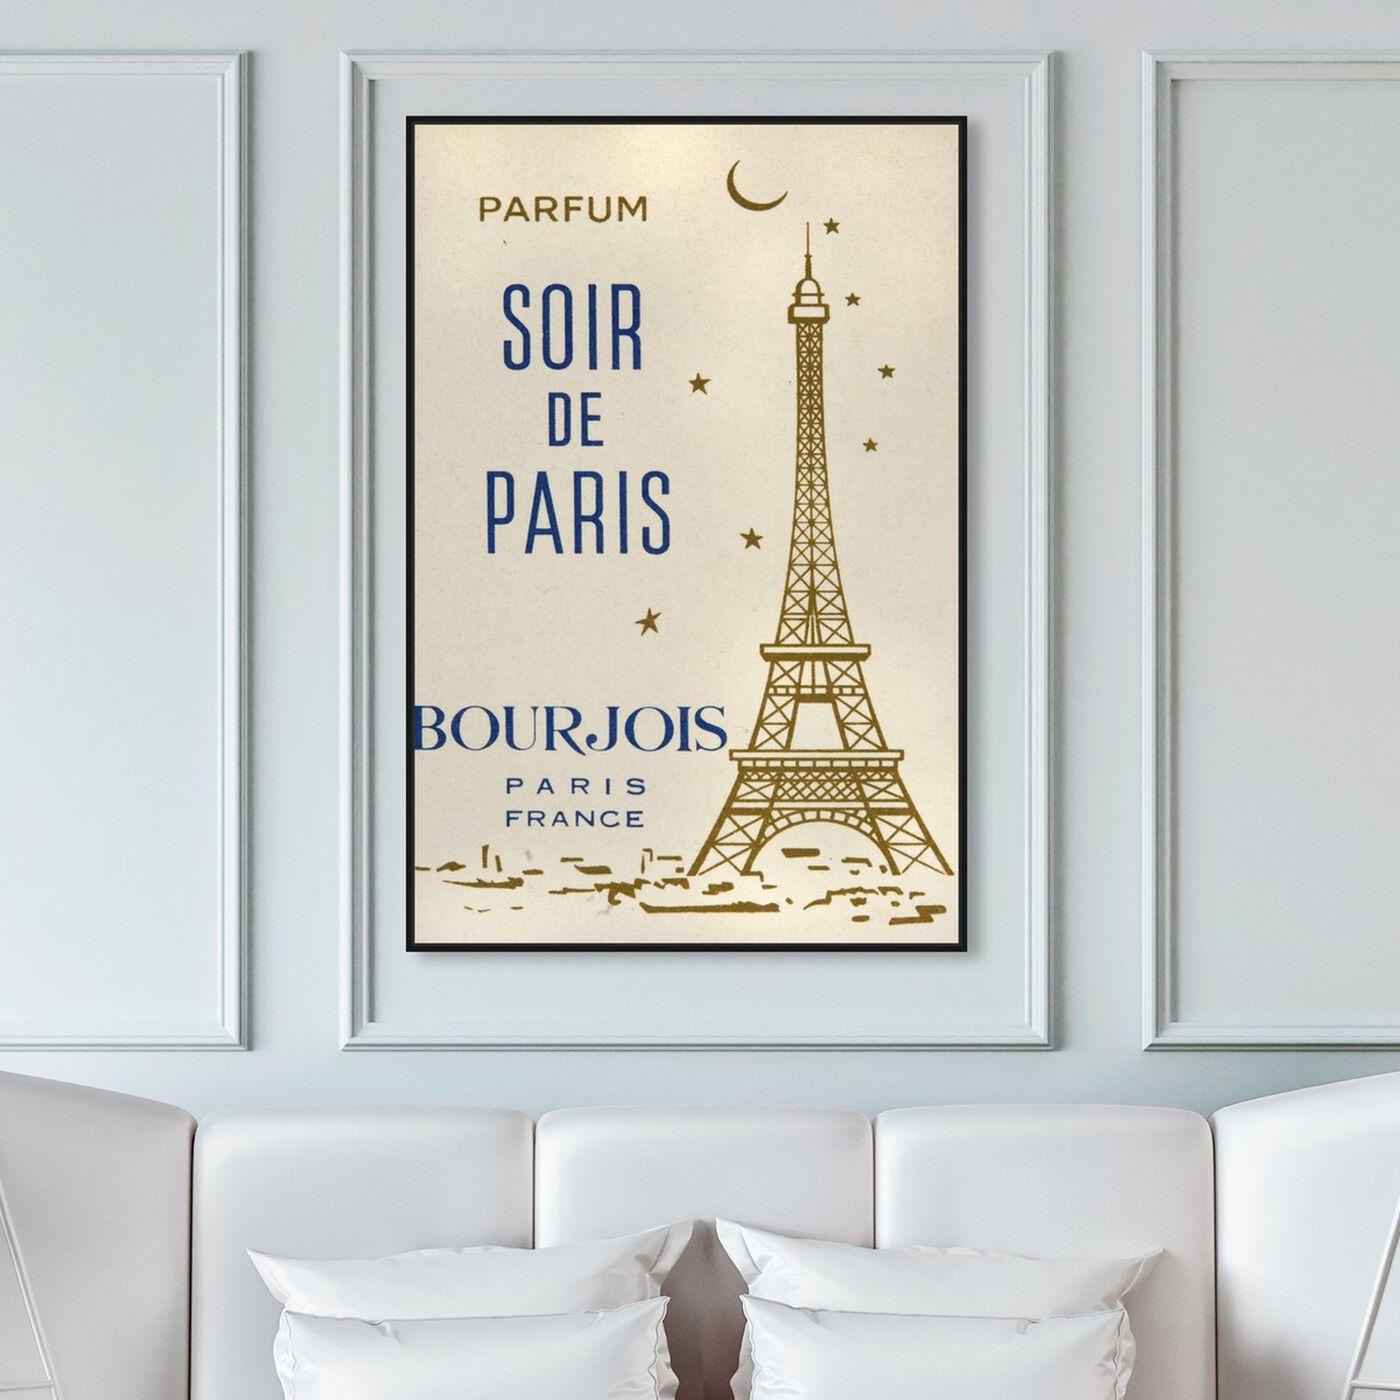 Hanging view of Parfum Soir de Paris featuring cities and skylines and european cities art.